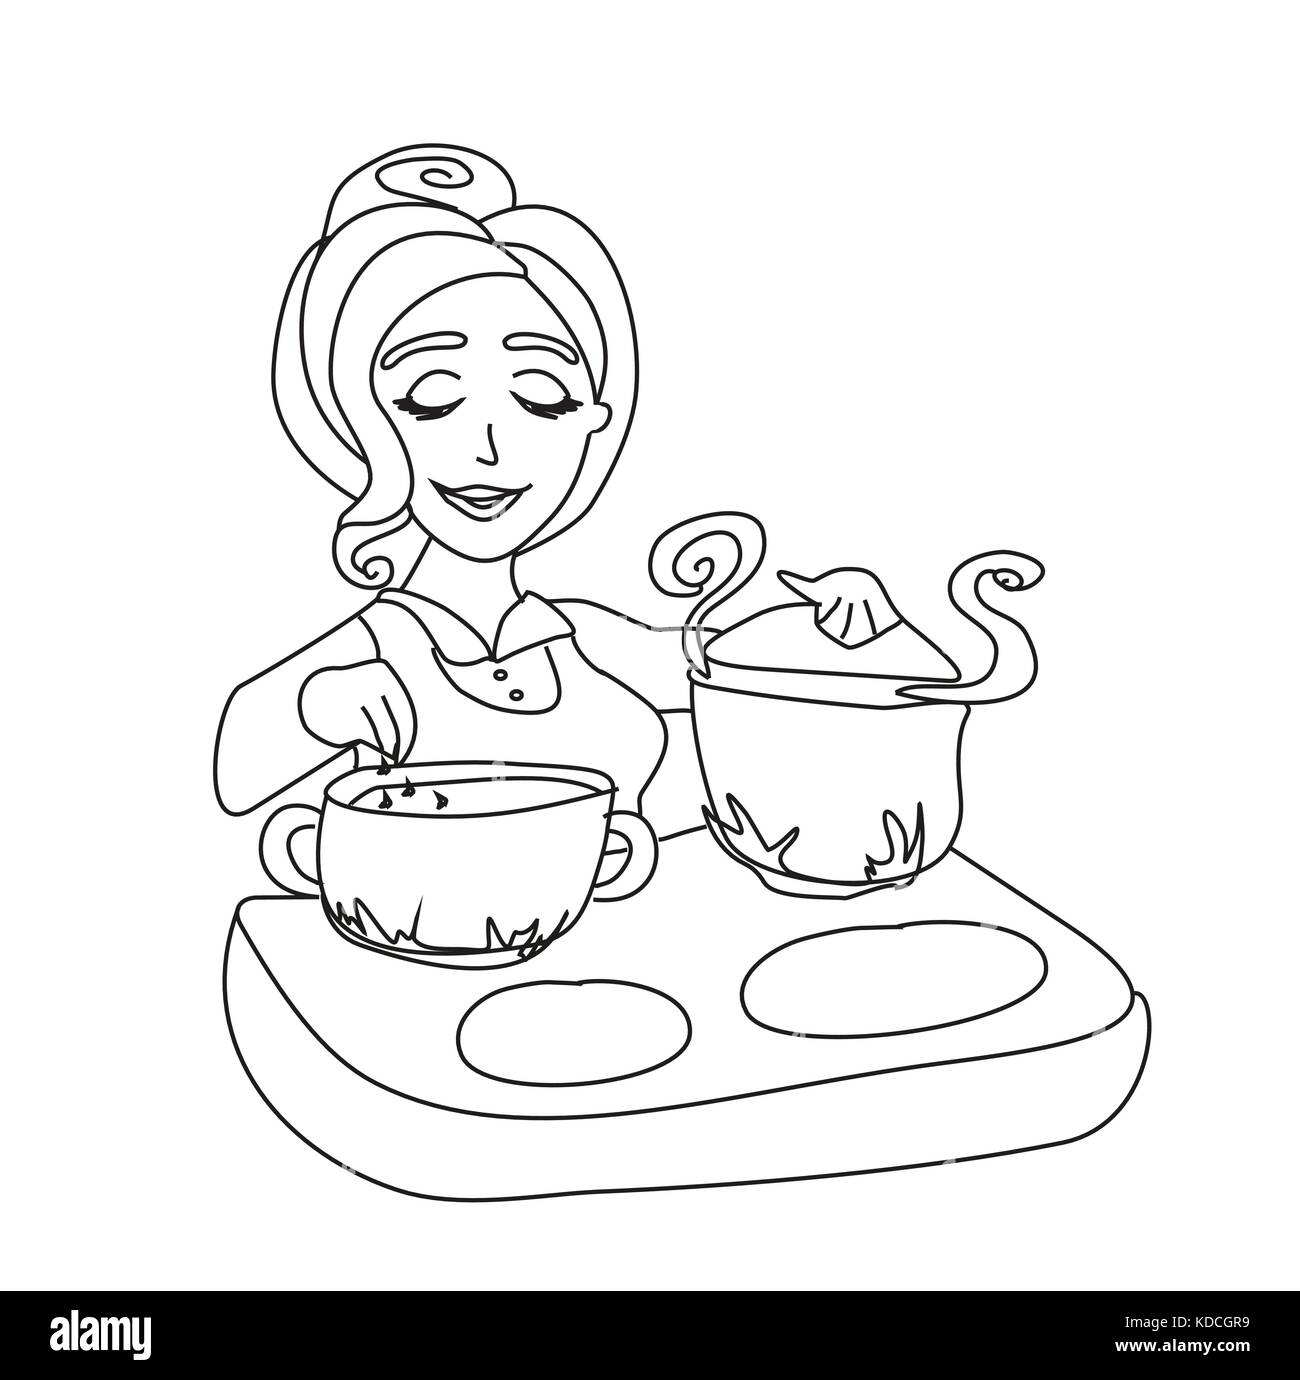 Female Cartoon Chef Black And White Stock Photos Images Alamy